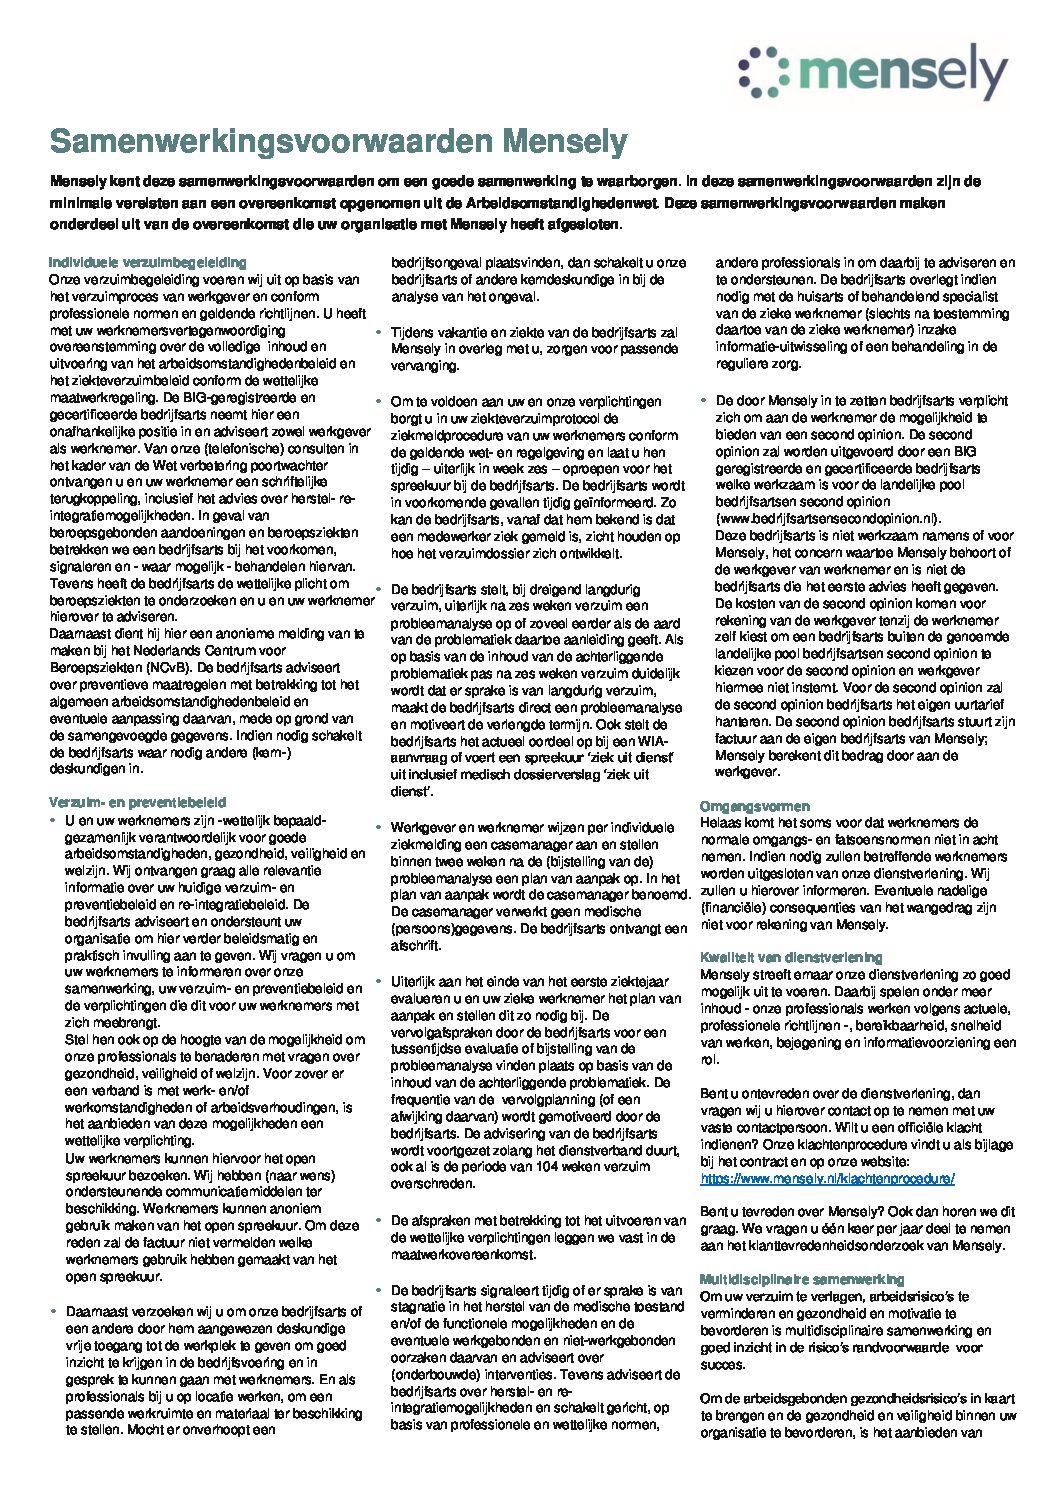 201118 Mensely-samenwerkingsvoorwaarden-11-2020_DEF